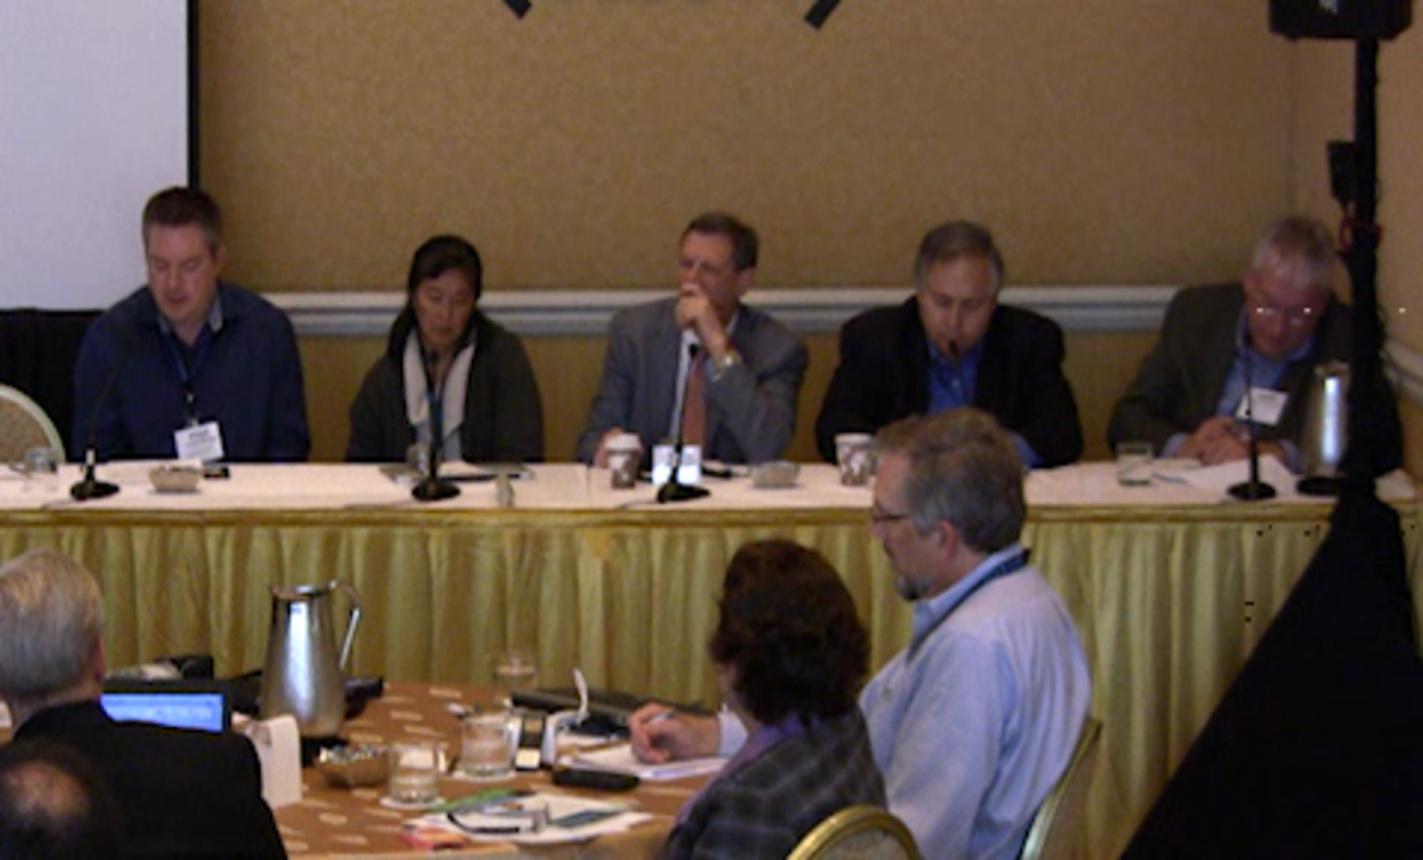 Panel Discussion - ETAP San Jose 2015